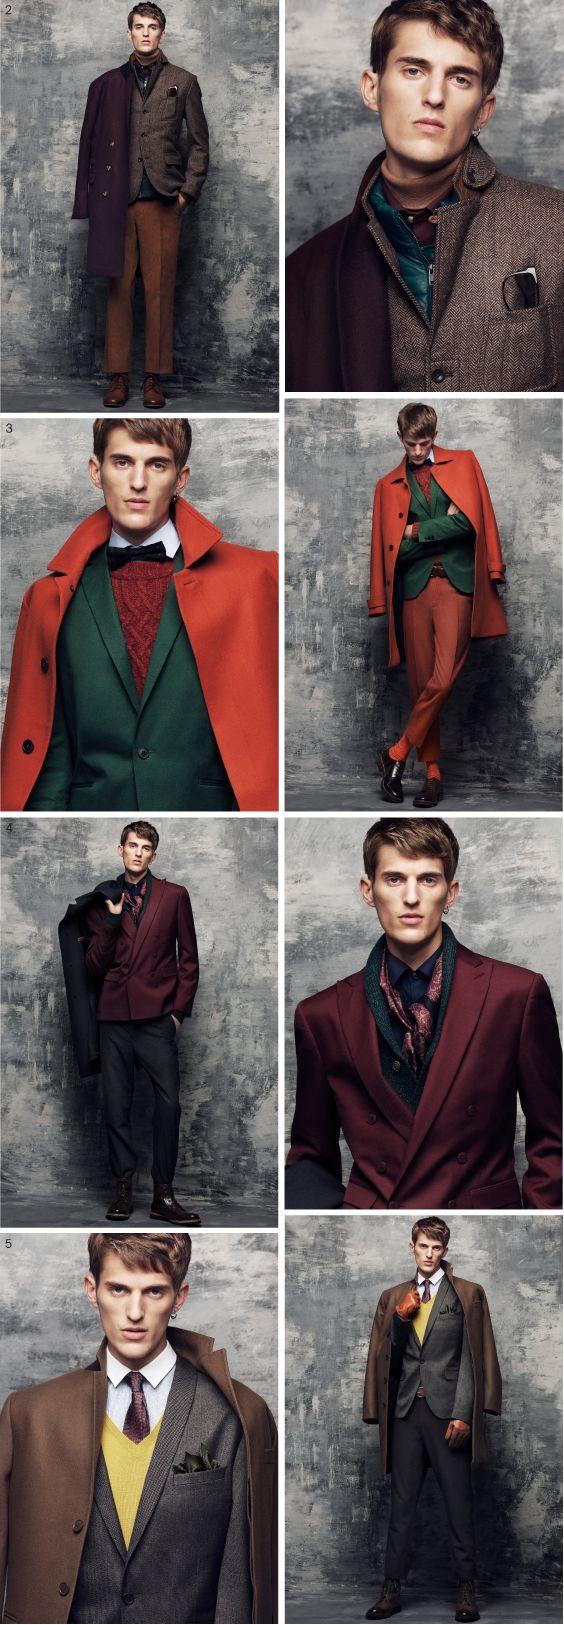 H & M Life | H & M US: Men Clothing, Fall Wint, Fall Colors, Colors Combinations, Men Fashion, Men'S Fashion, Elegant Menswear, Comforter Menswear, Eccentric Menswear